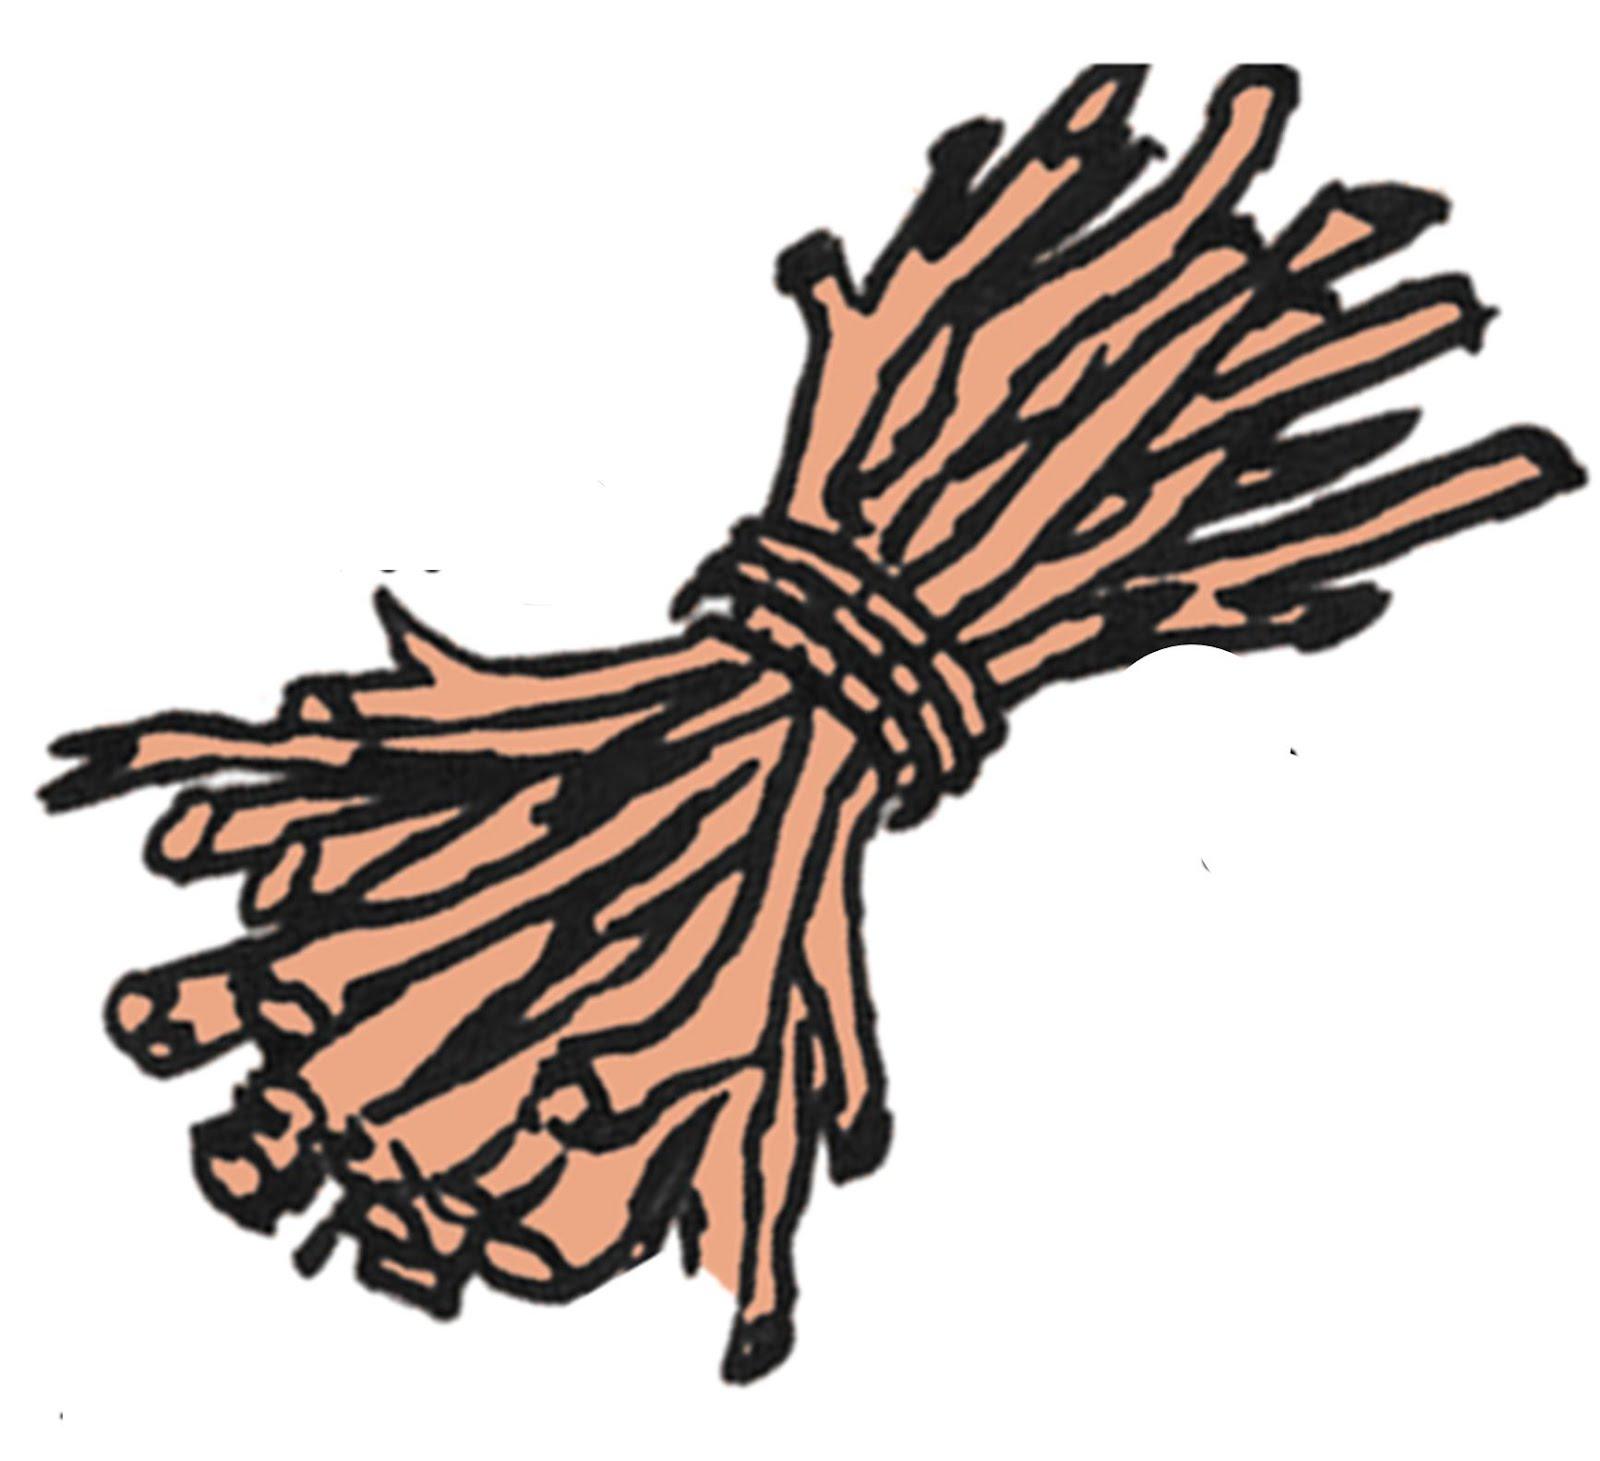 Sticks Cliparts-Sticks cliparts-15